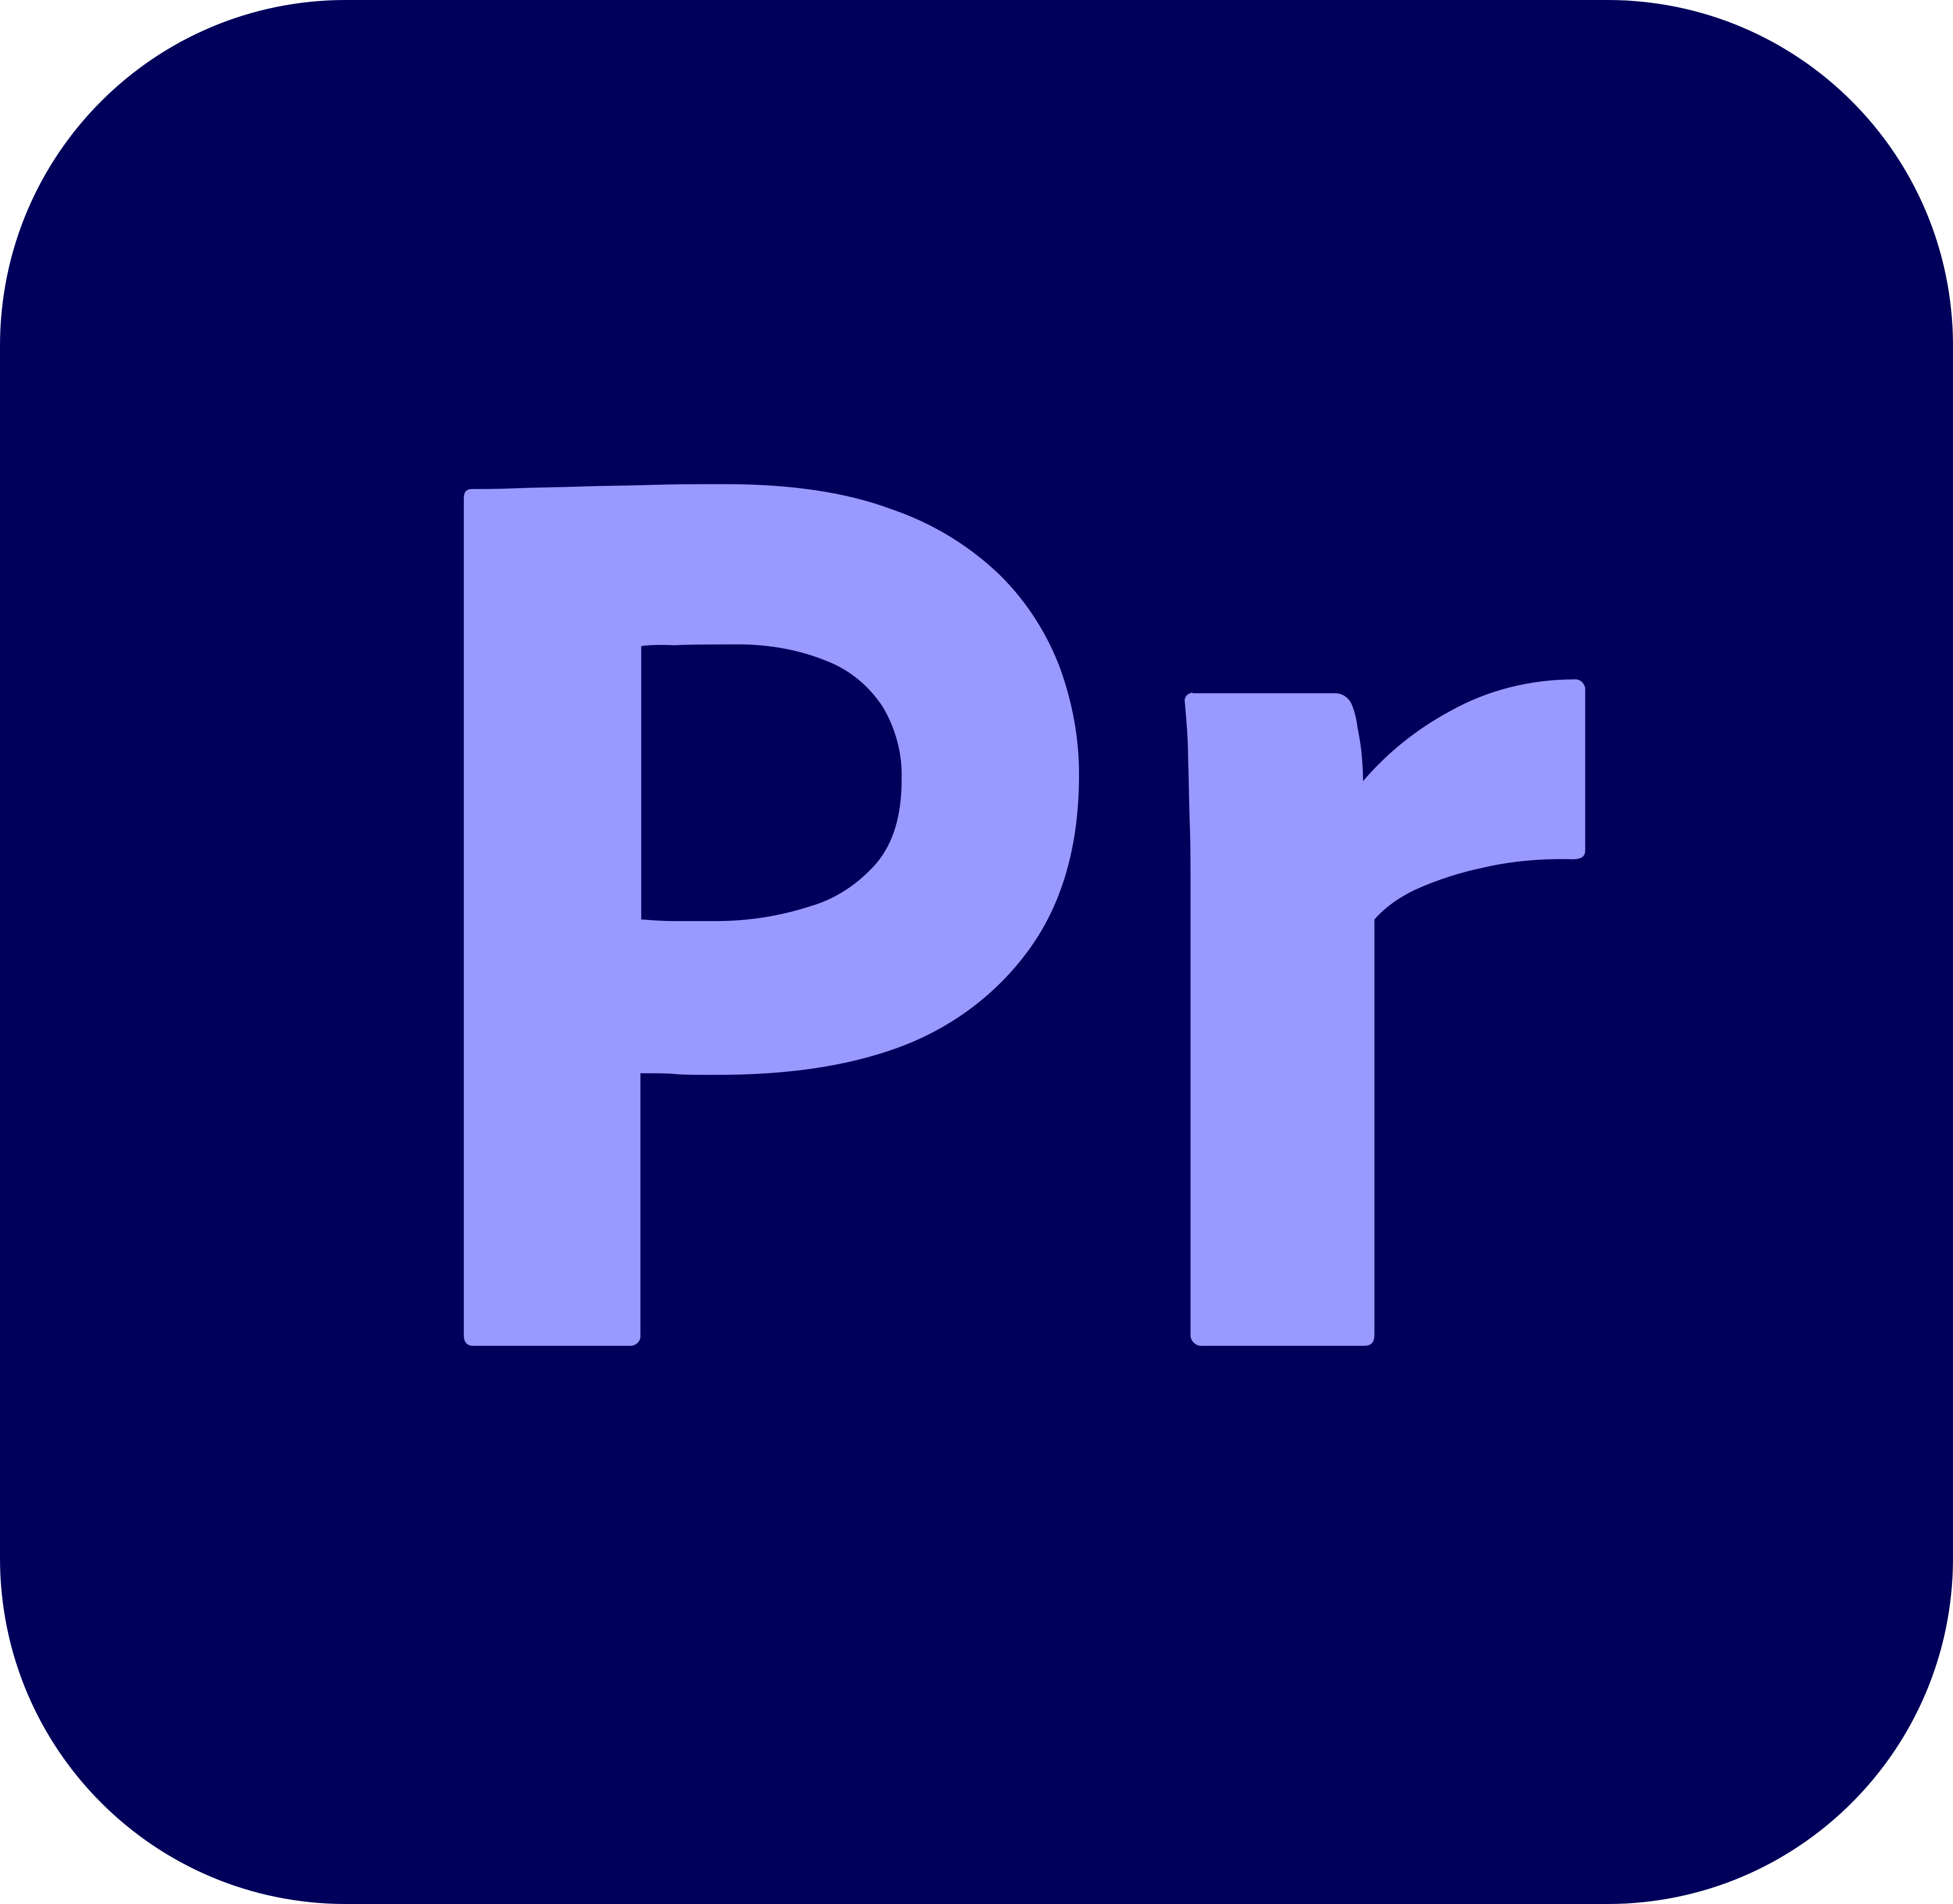 adobe premiere pro logo 5 - Adobe Premiere Pro Logo